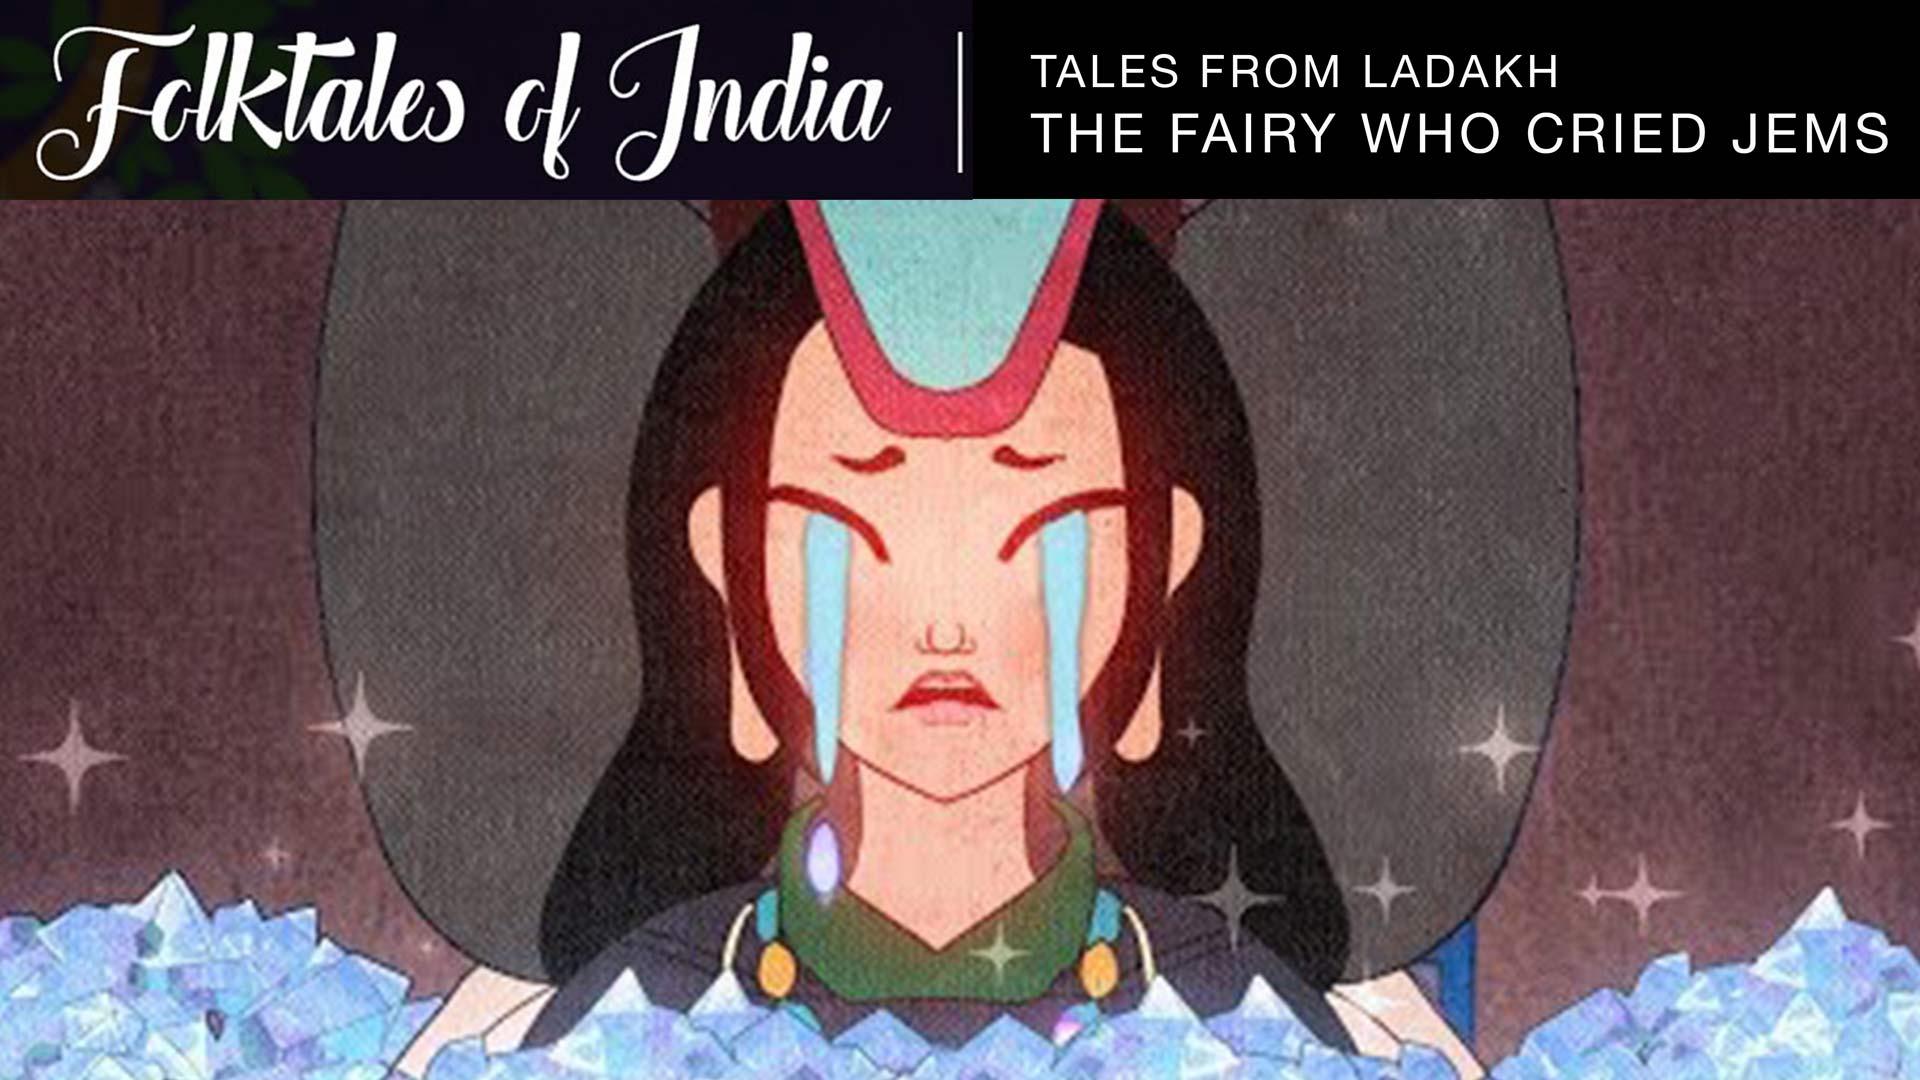 fairy crying gems